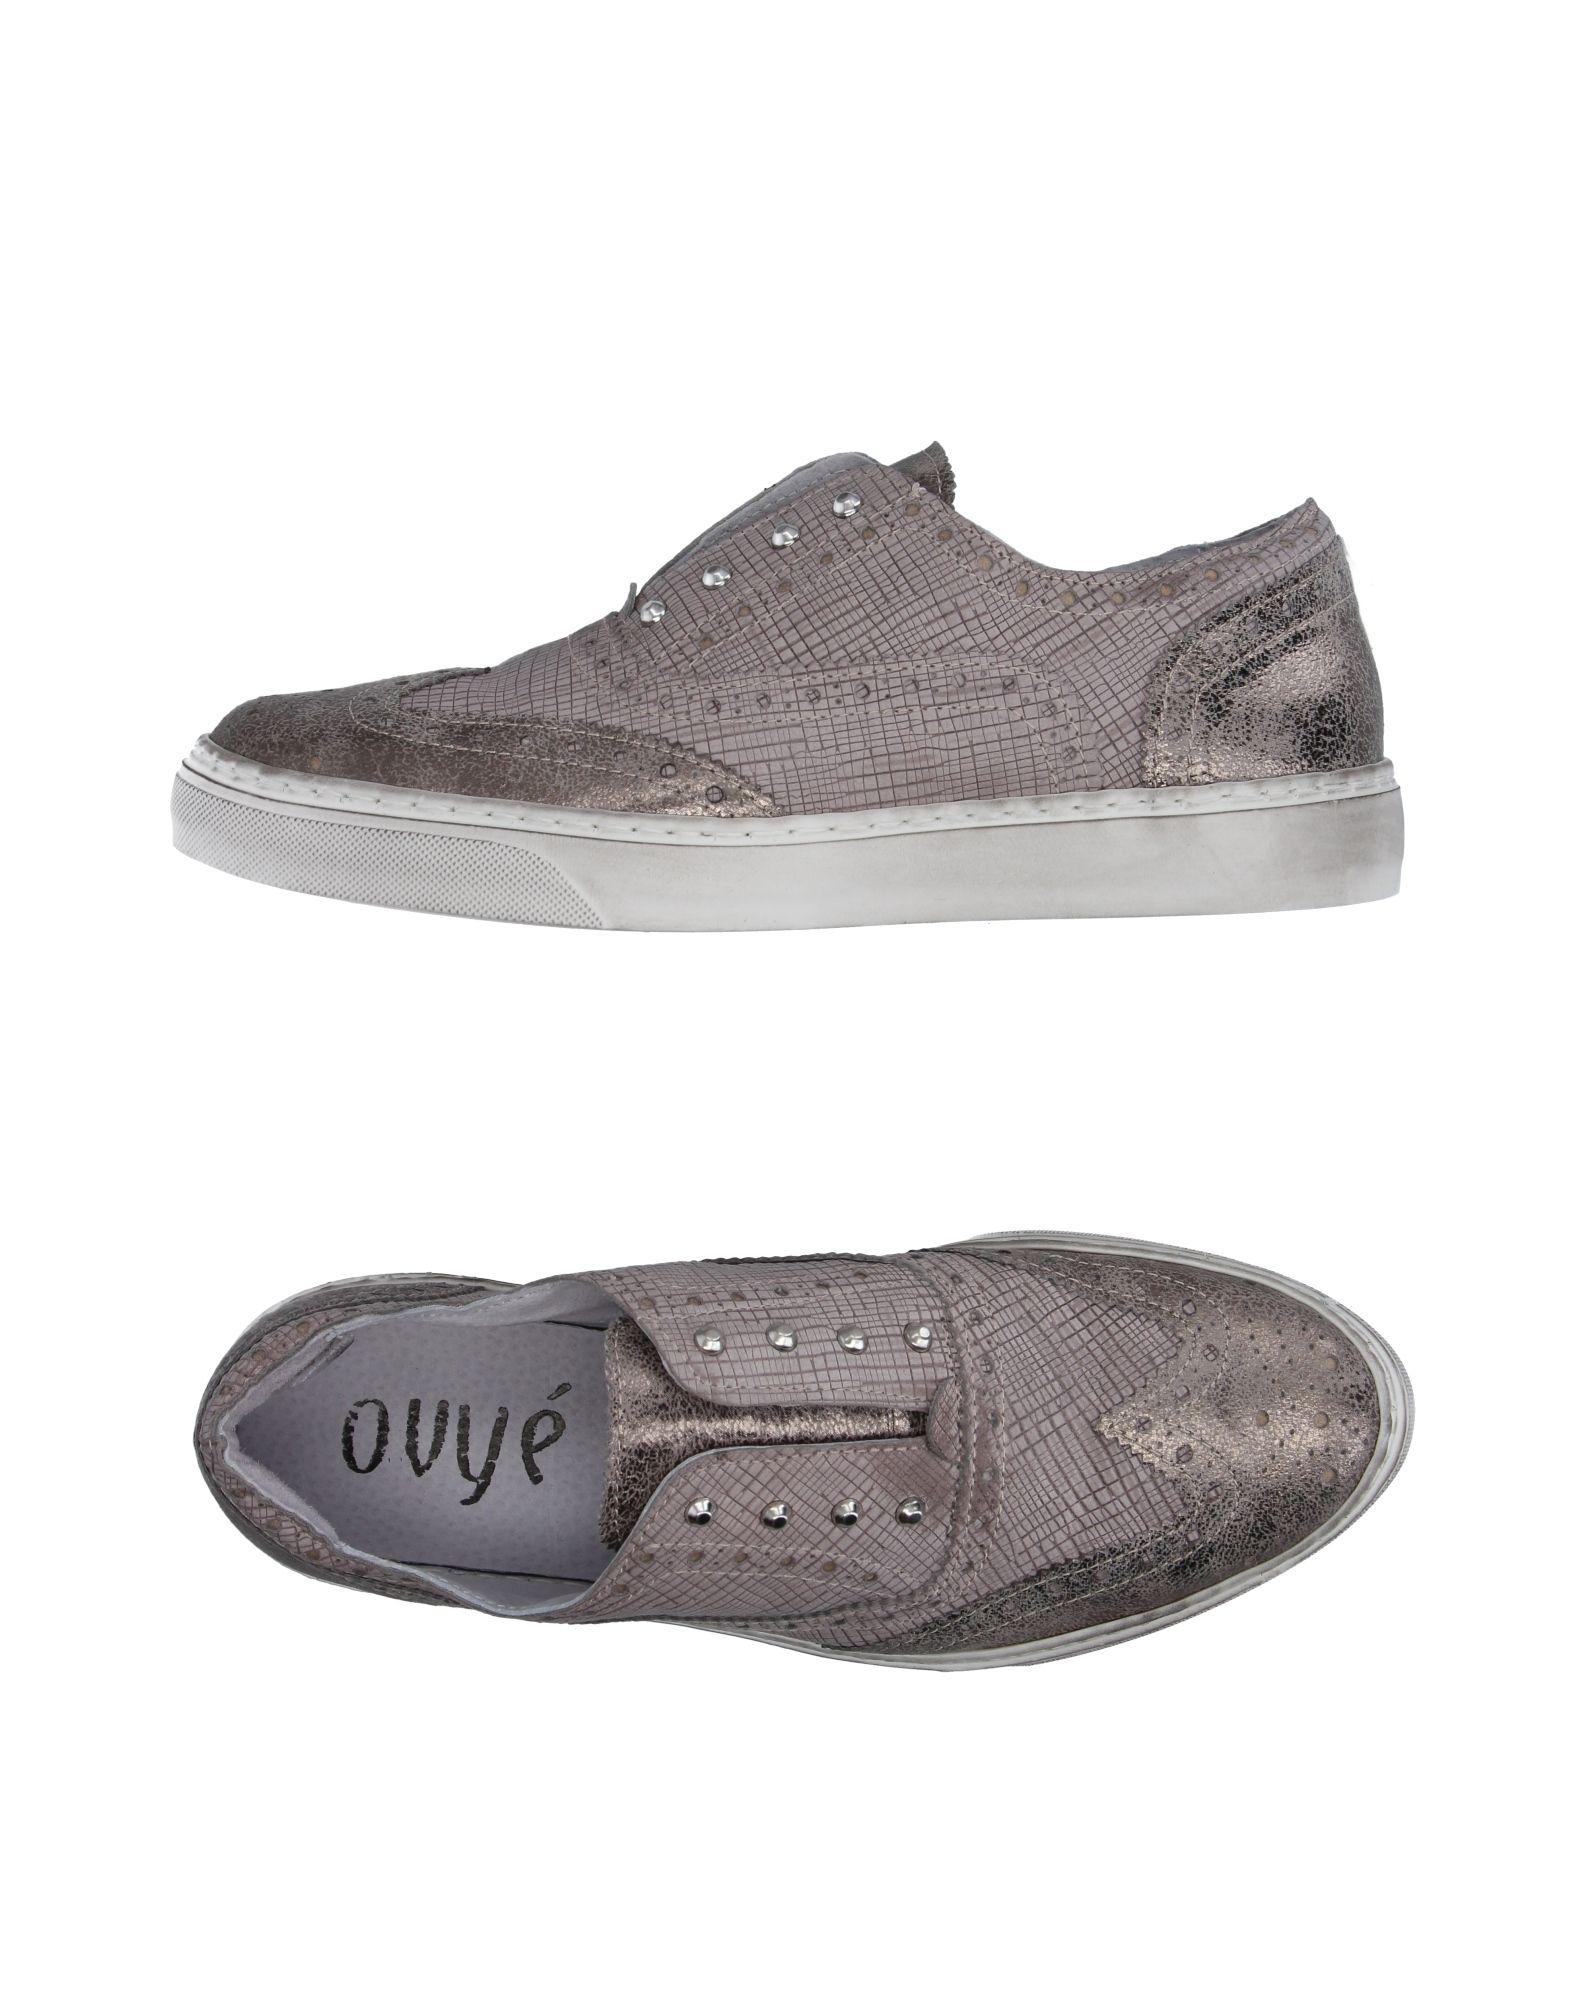 Ovye' By Cristina Lucchi Sneakers Damen  Schuhe 11161640SP Gute Qualität beliebte Schuhe  6f4260